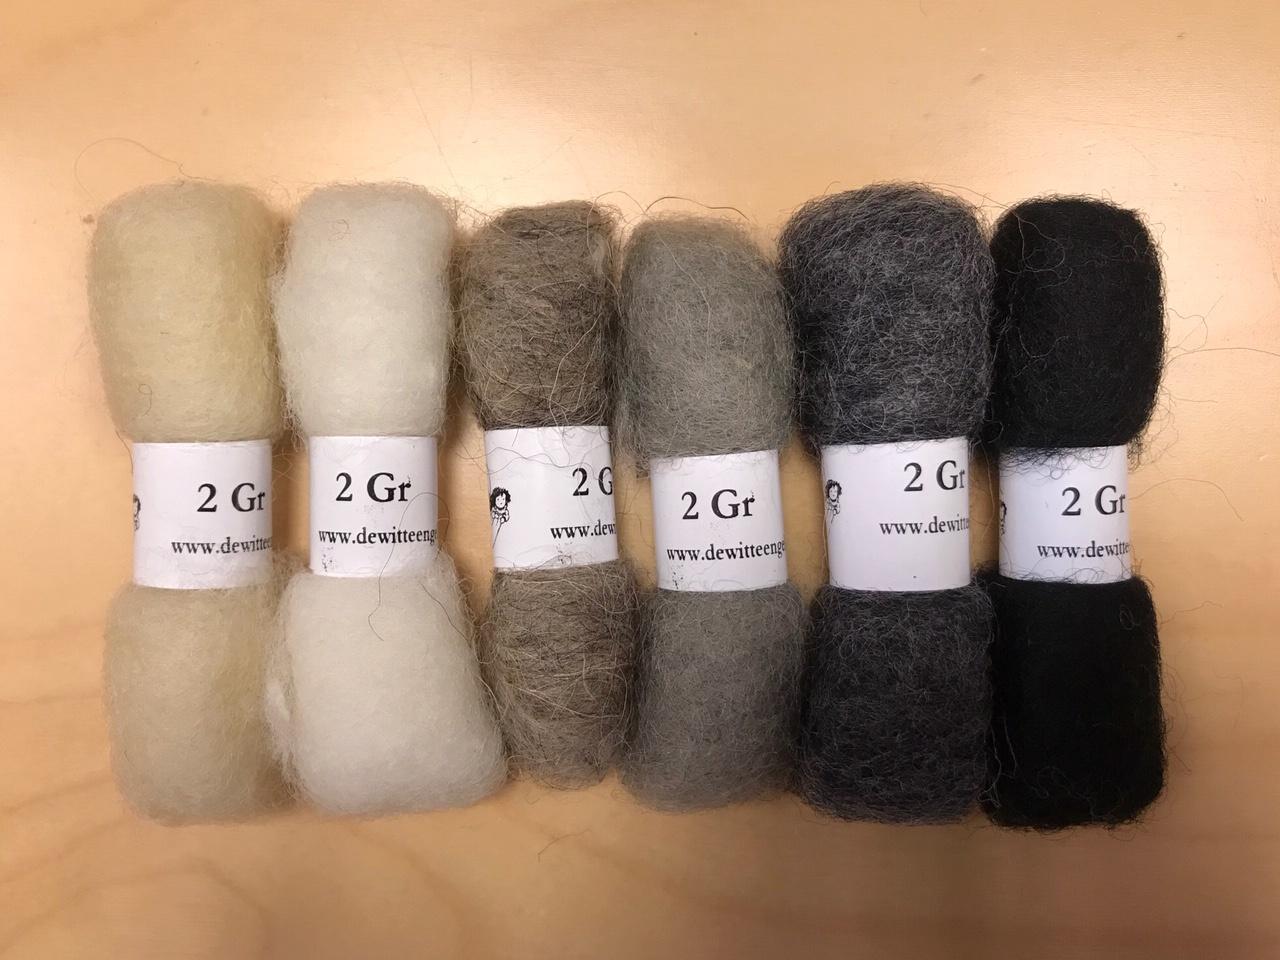 Bheda wool Bhedawol Set - Mini 6 stuks 2 gr. - Wit/Grijs/Zwart